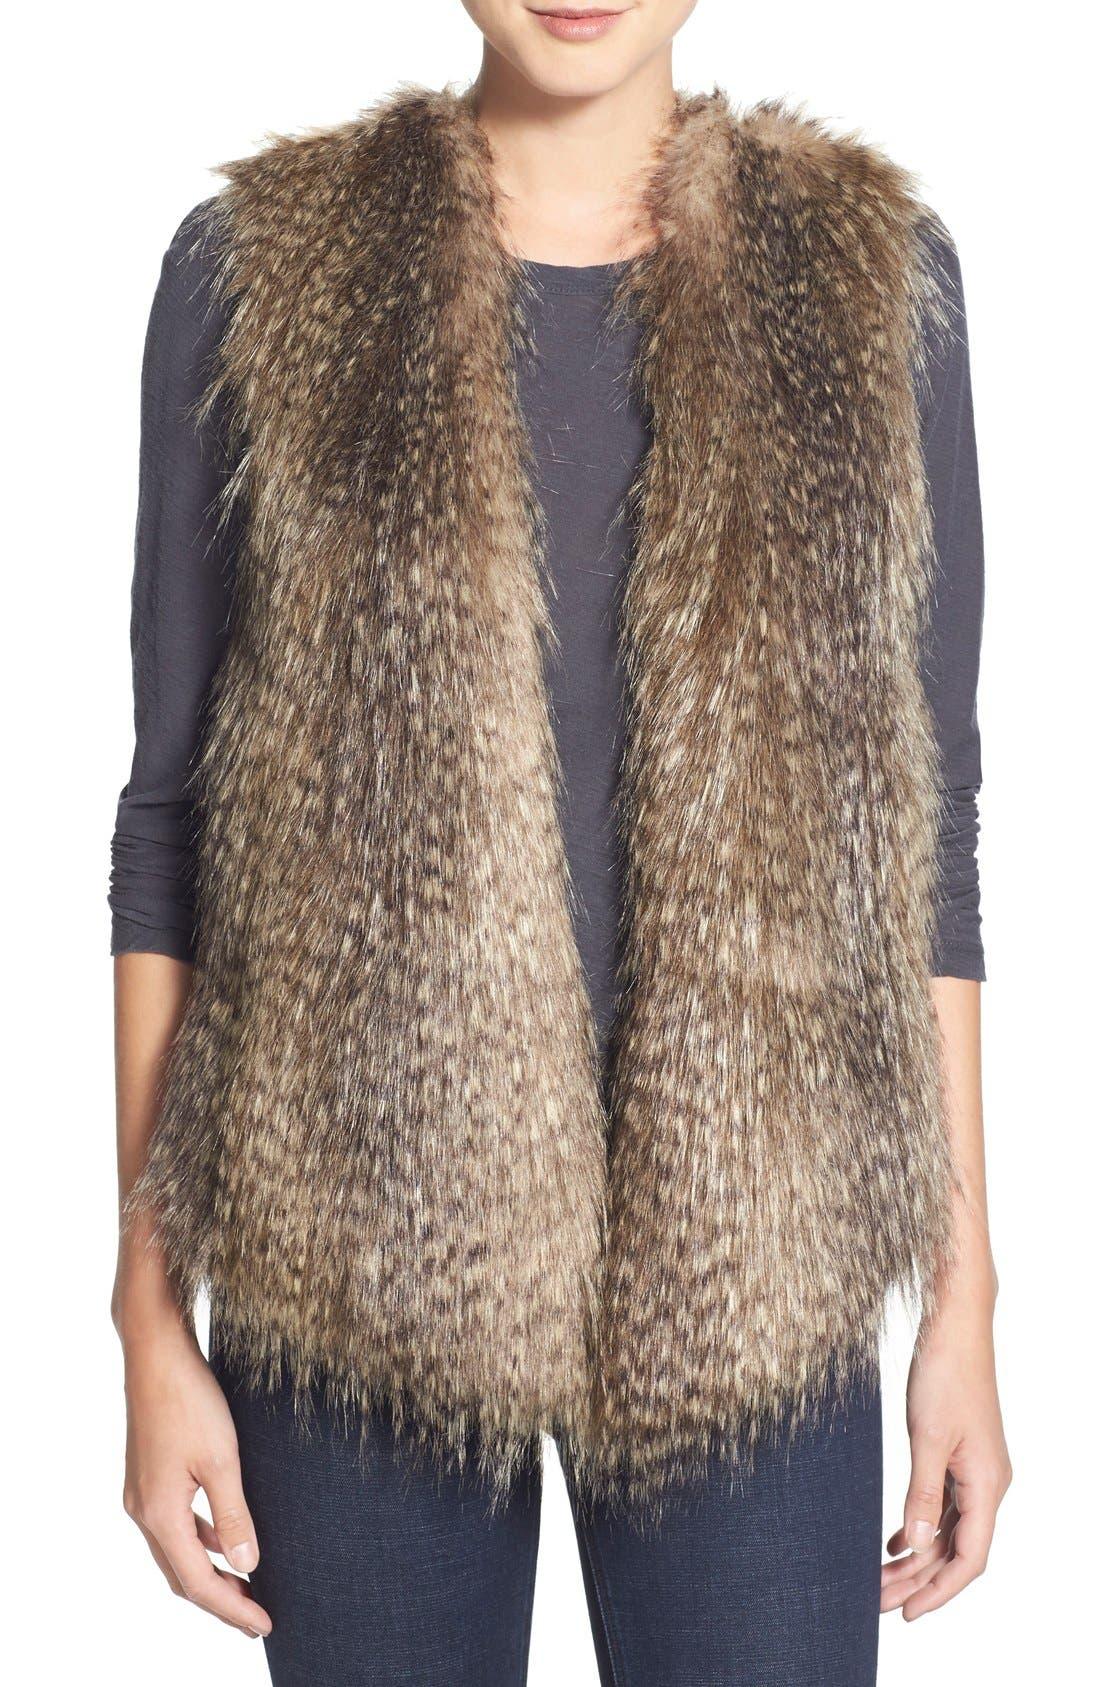 Main Image - Ella Moss 'Lyla' Faux Fur Knit Back Vest